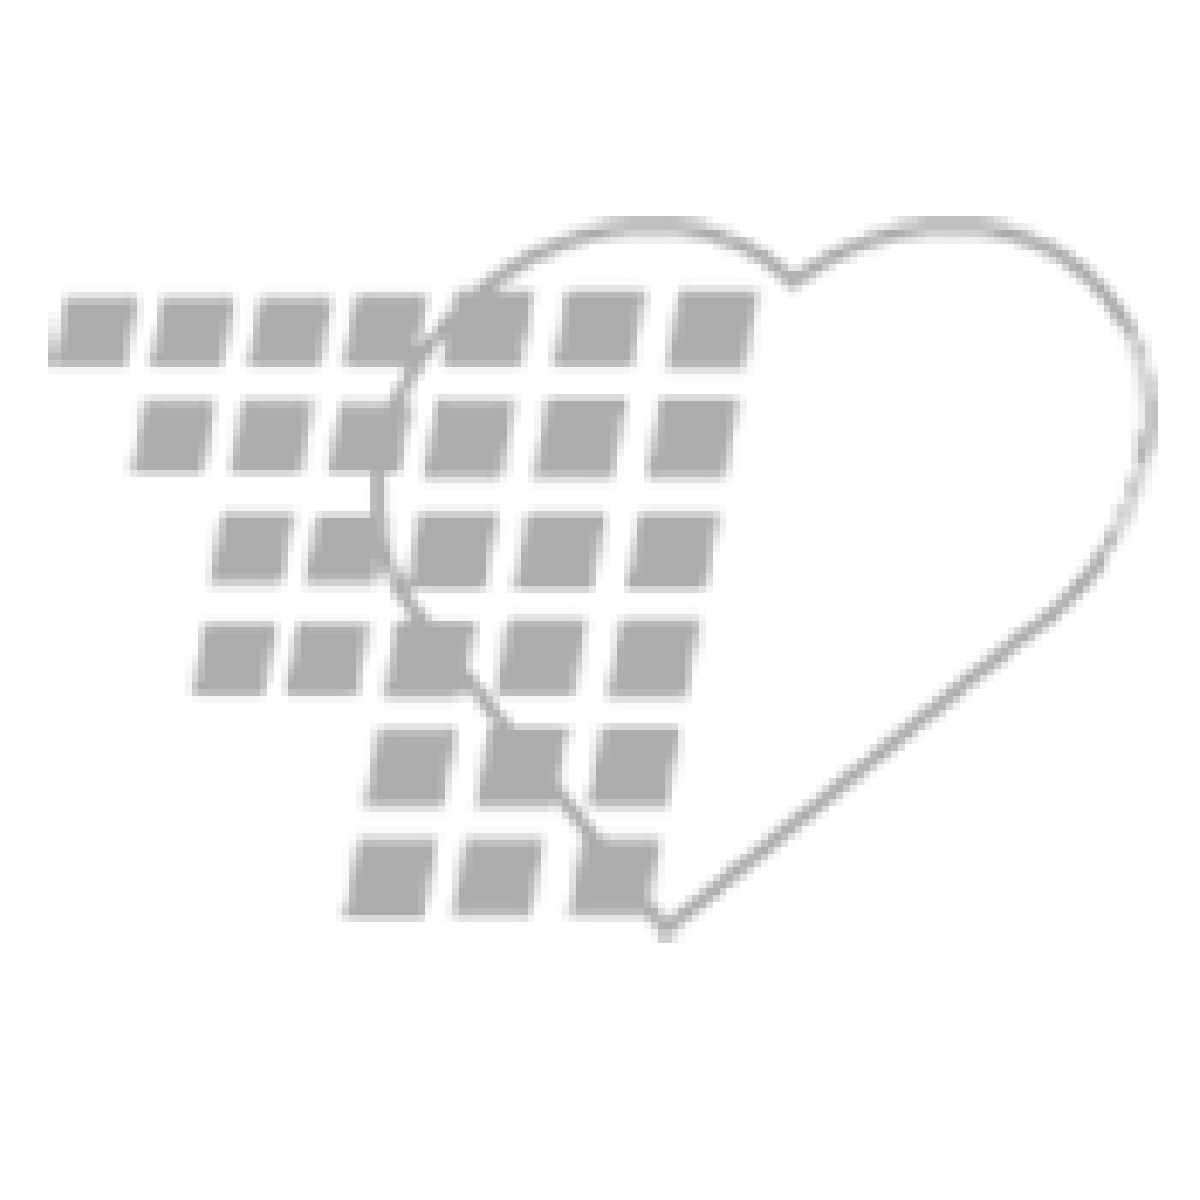 10-81-0058 - Prostate Examination Trainer